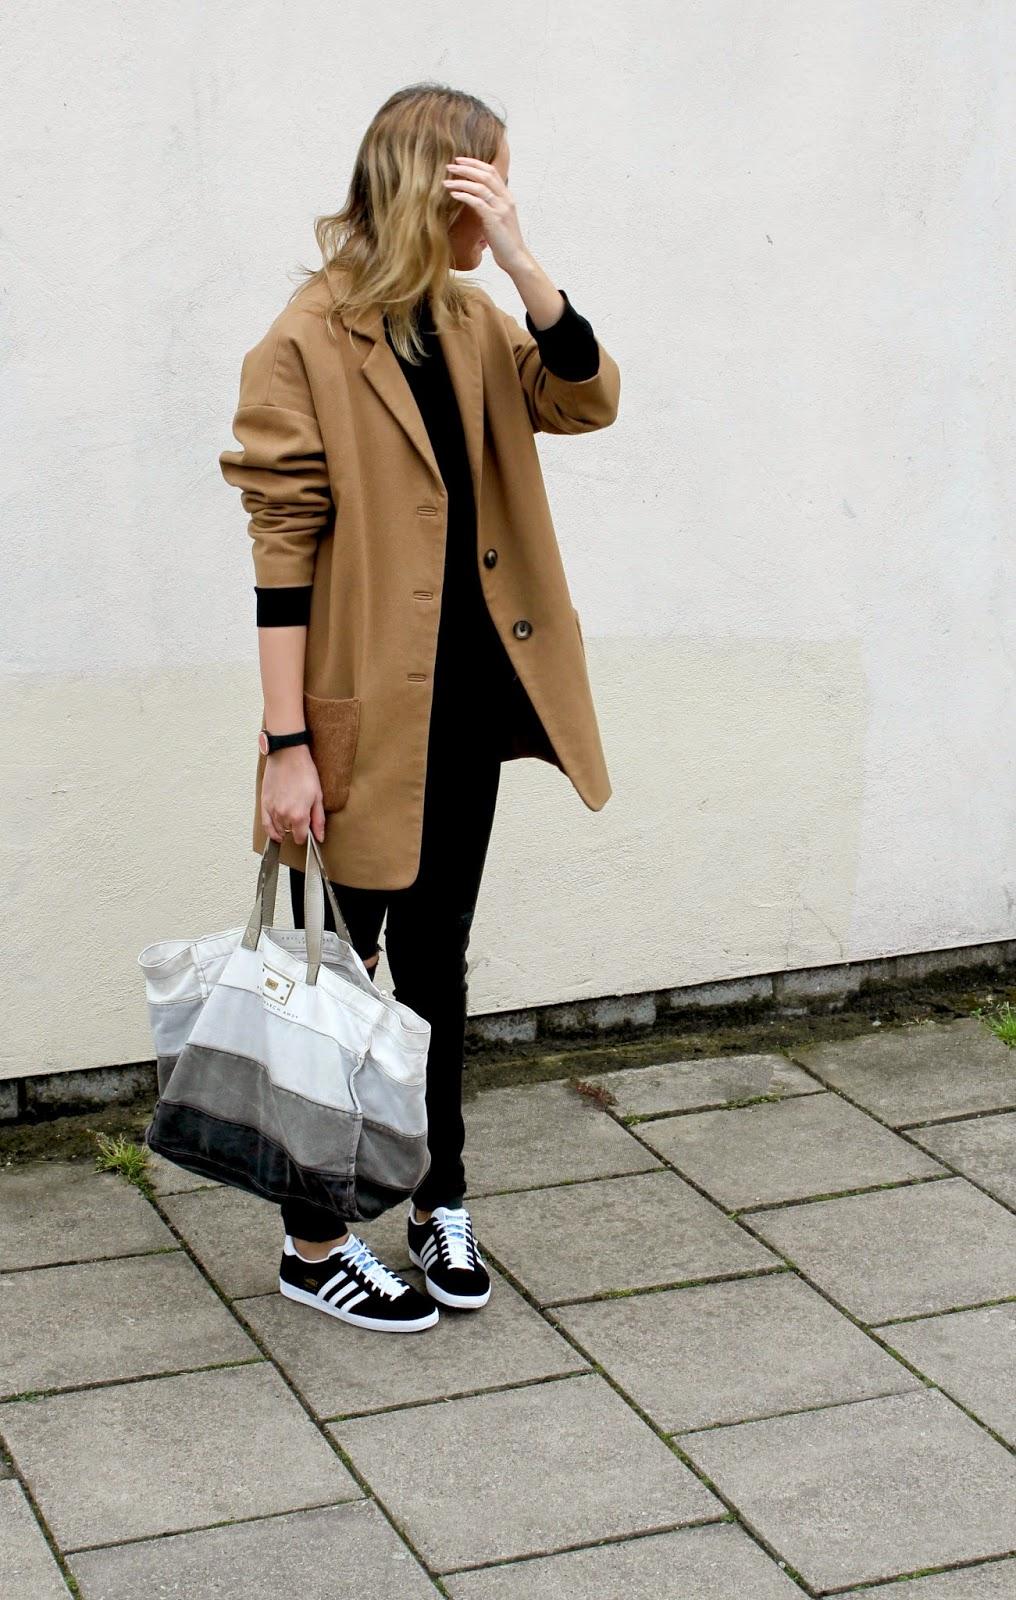 Gazelle Adidas Outfit